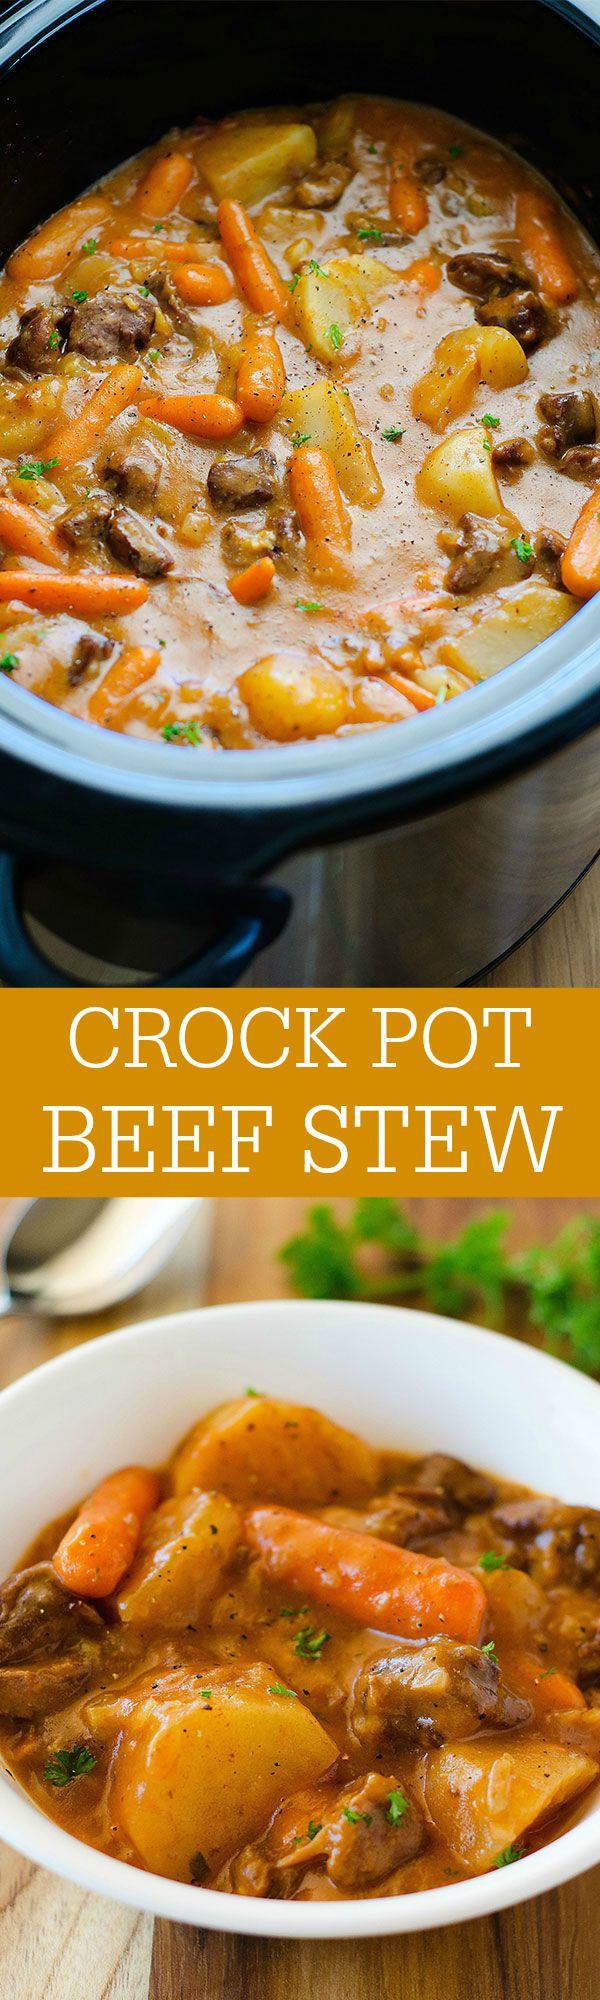 Beef Stew Recipes Crock Pot  Crock Pot Beef Stew